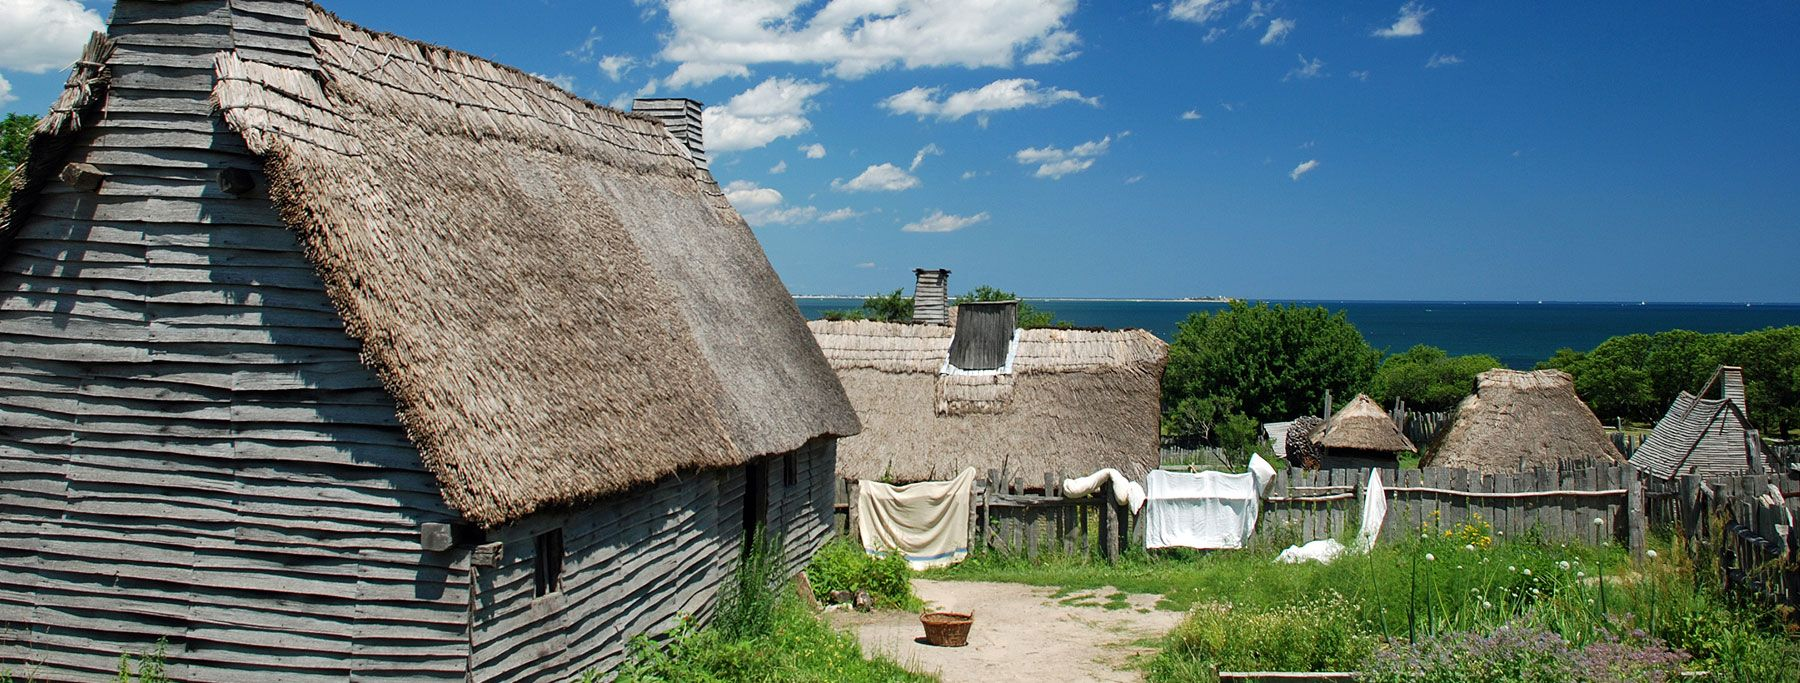 Plimoth Plantation History, Rare Animals and the